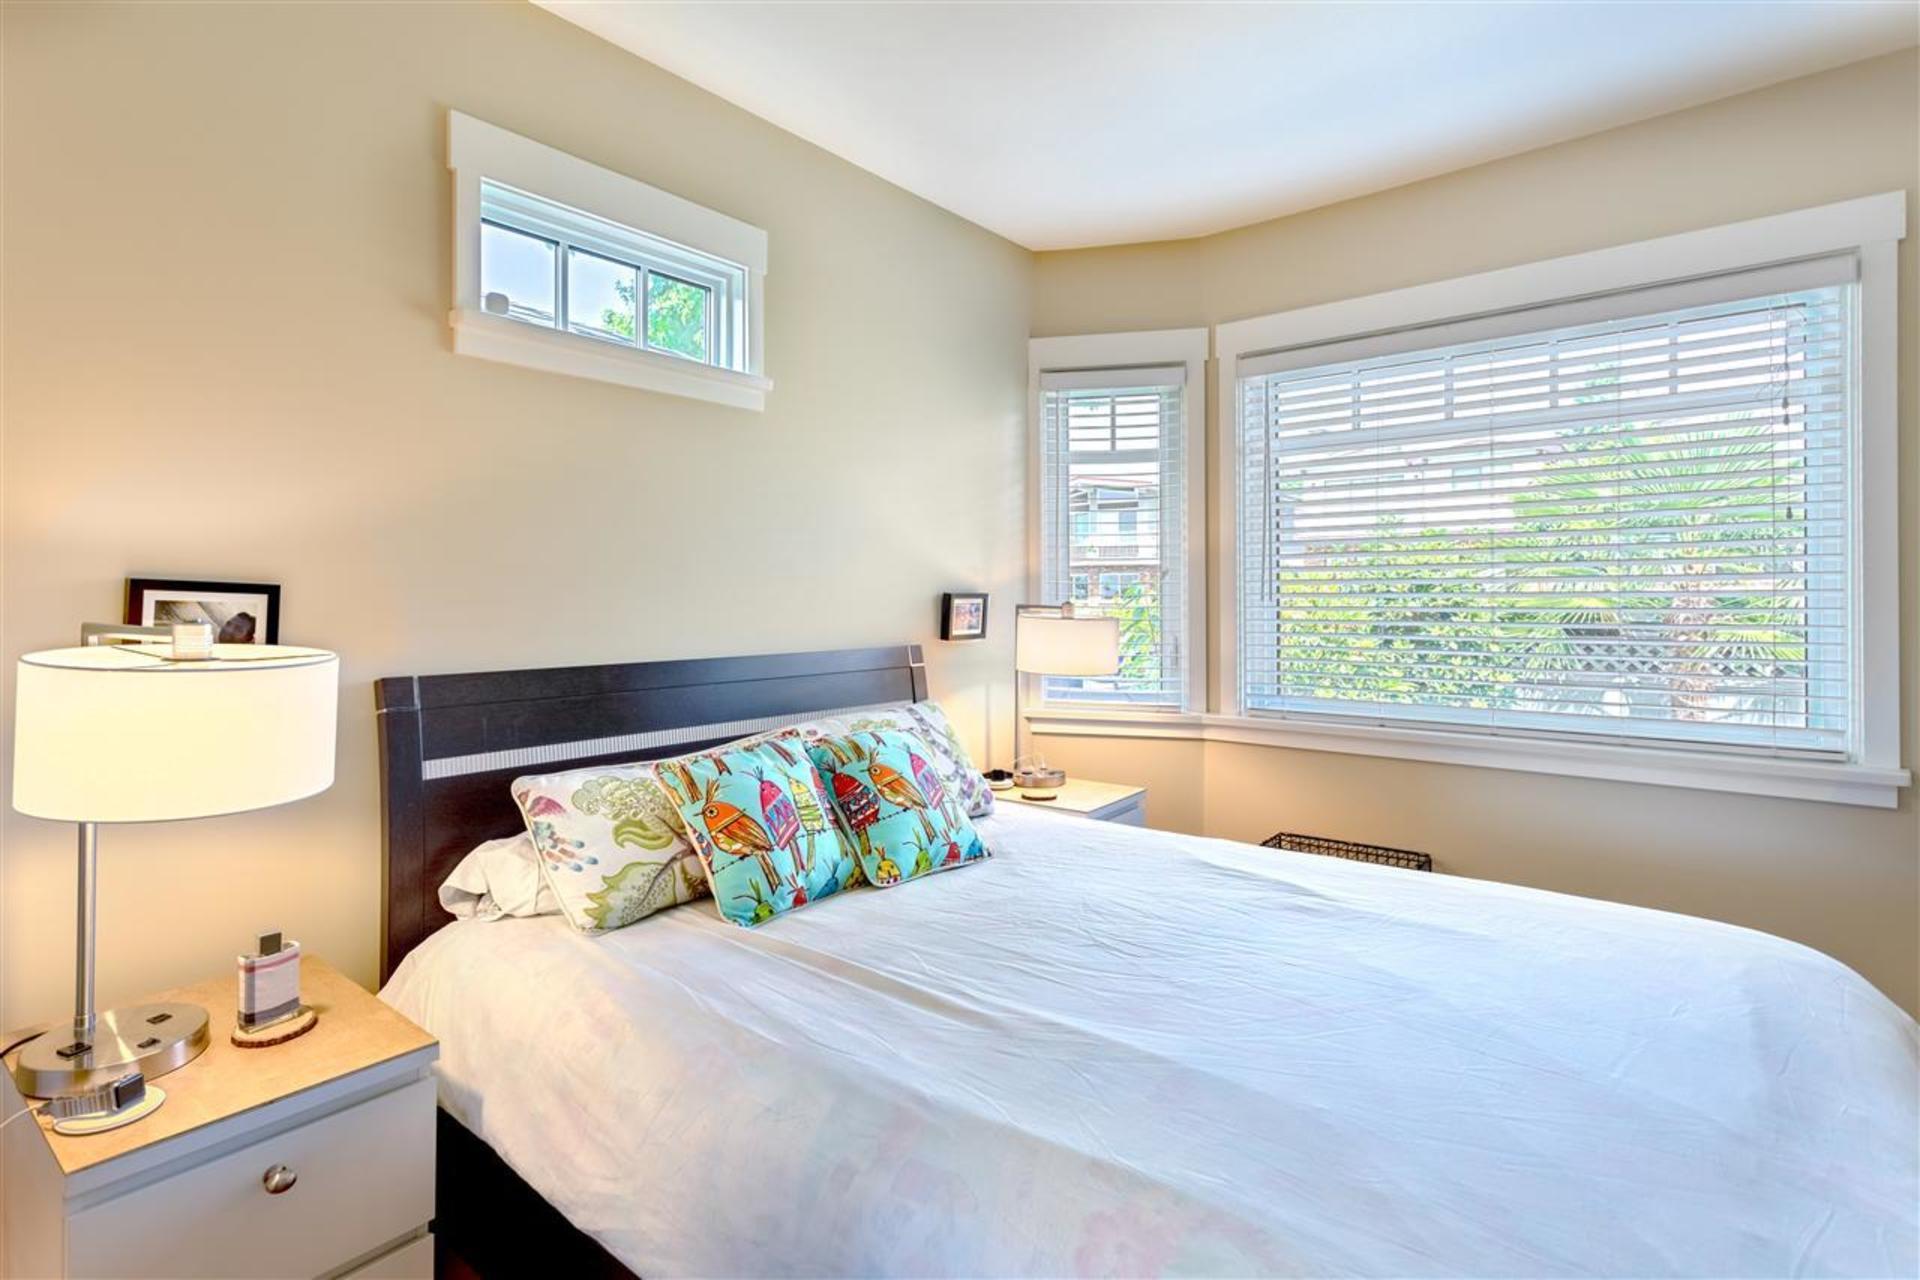 3912-parker-street-willingdon-heights-burnaby-north-12 at 3912 Parker Street, Willingdon Heights, Burnaby North